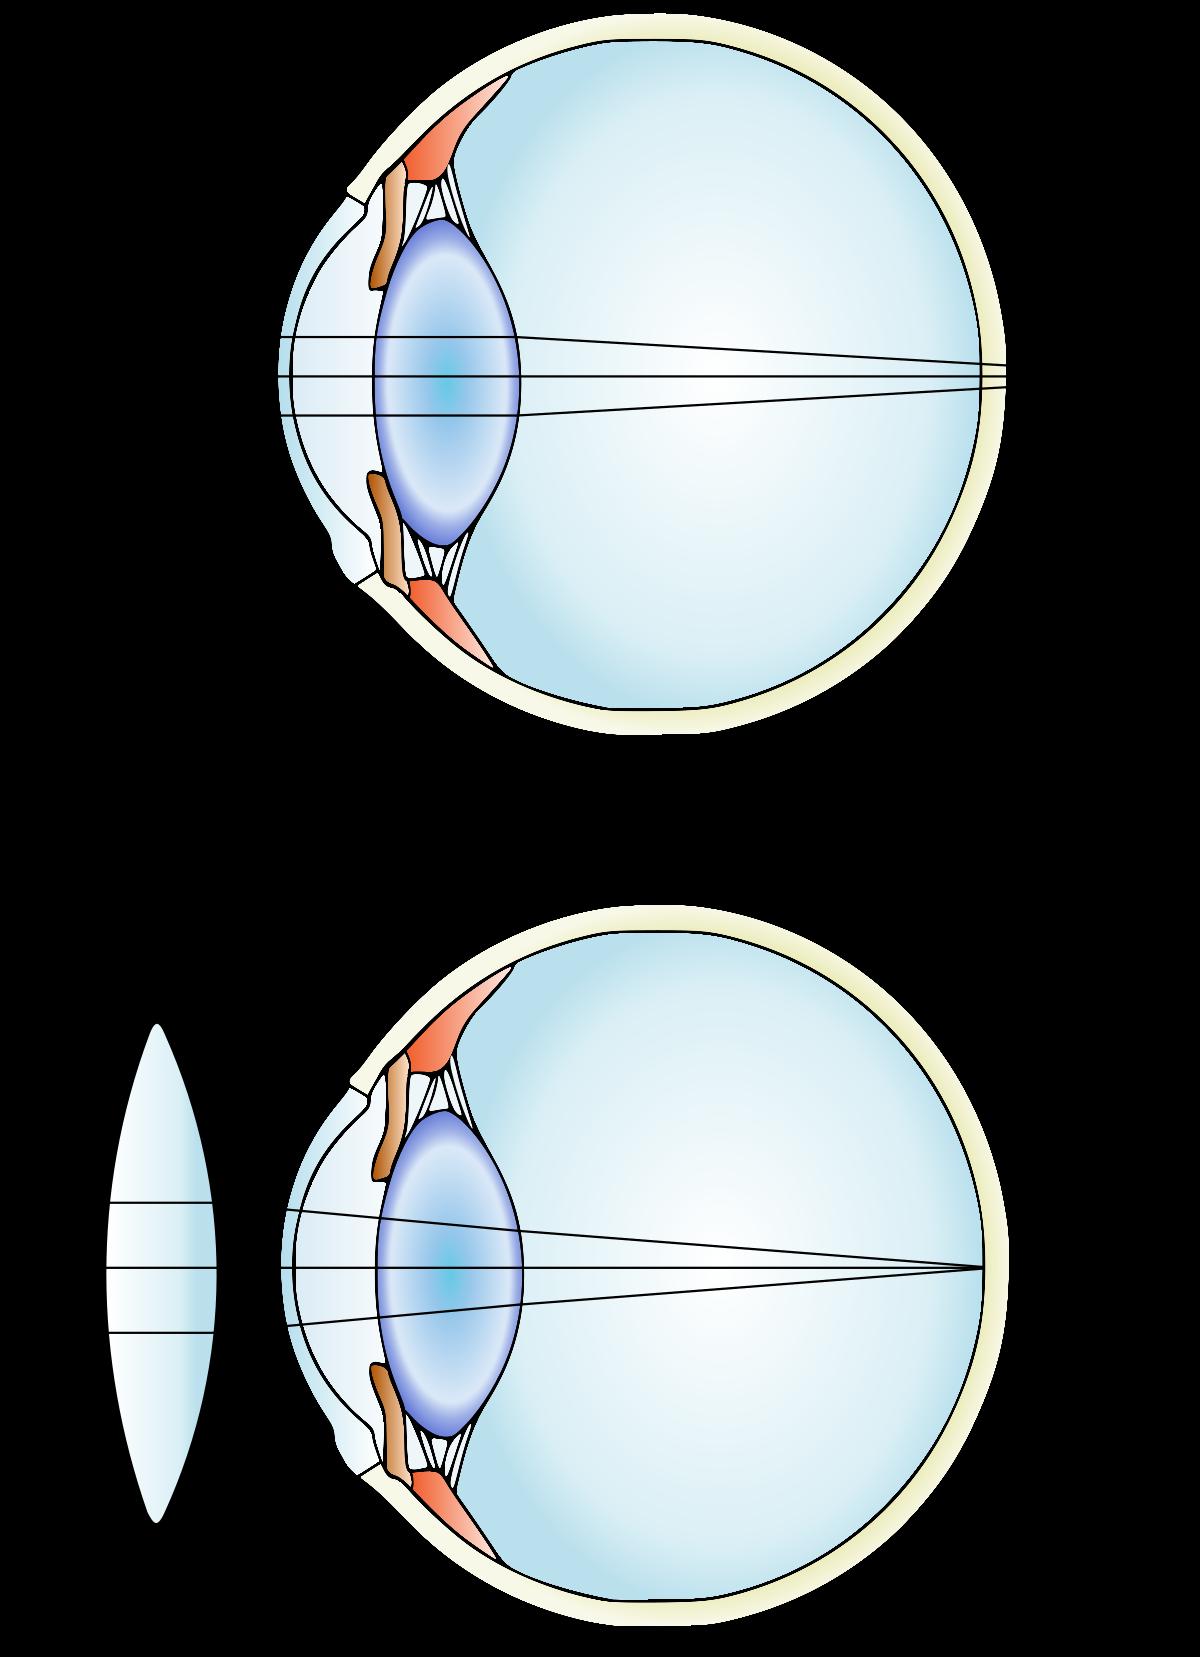 2 hyperopia vagy myopia